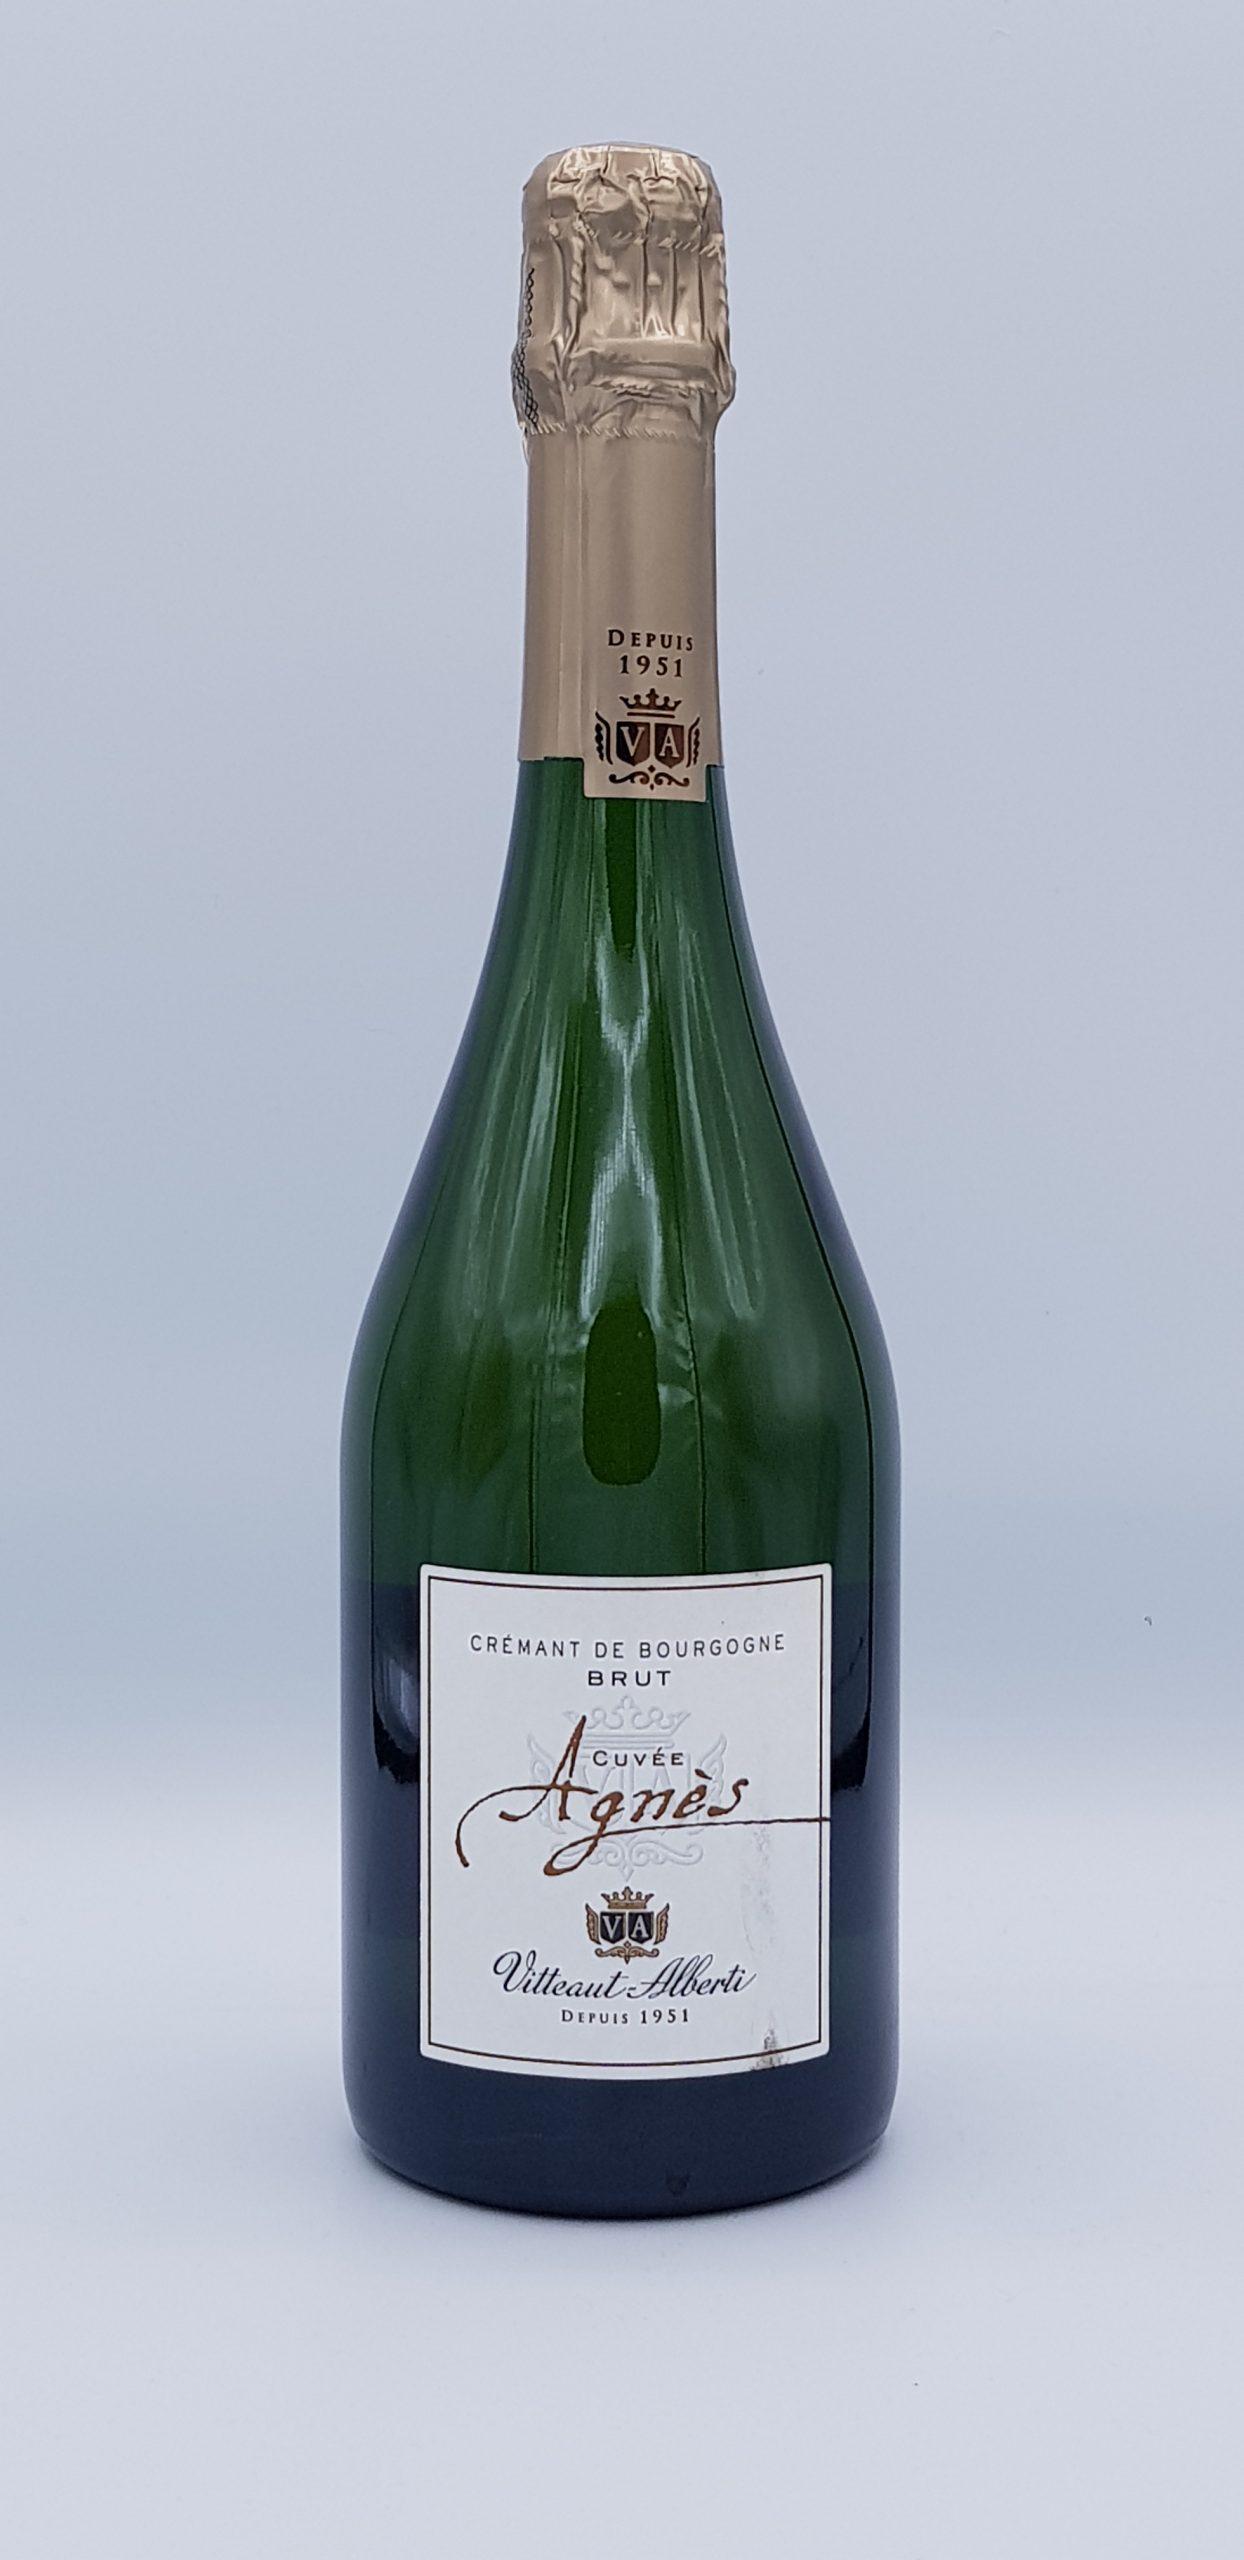 Cremant De Bourgogne Cuvee Agnes Vitteaut Alberti